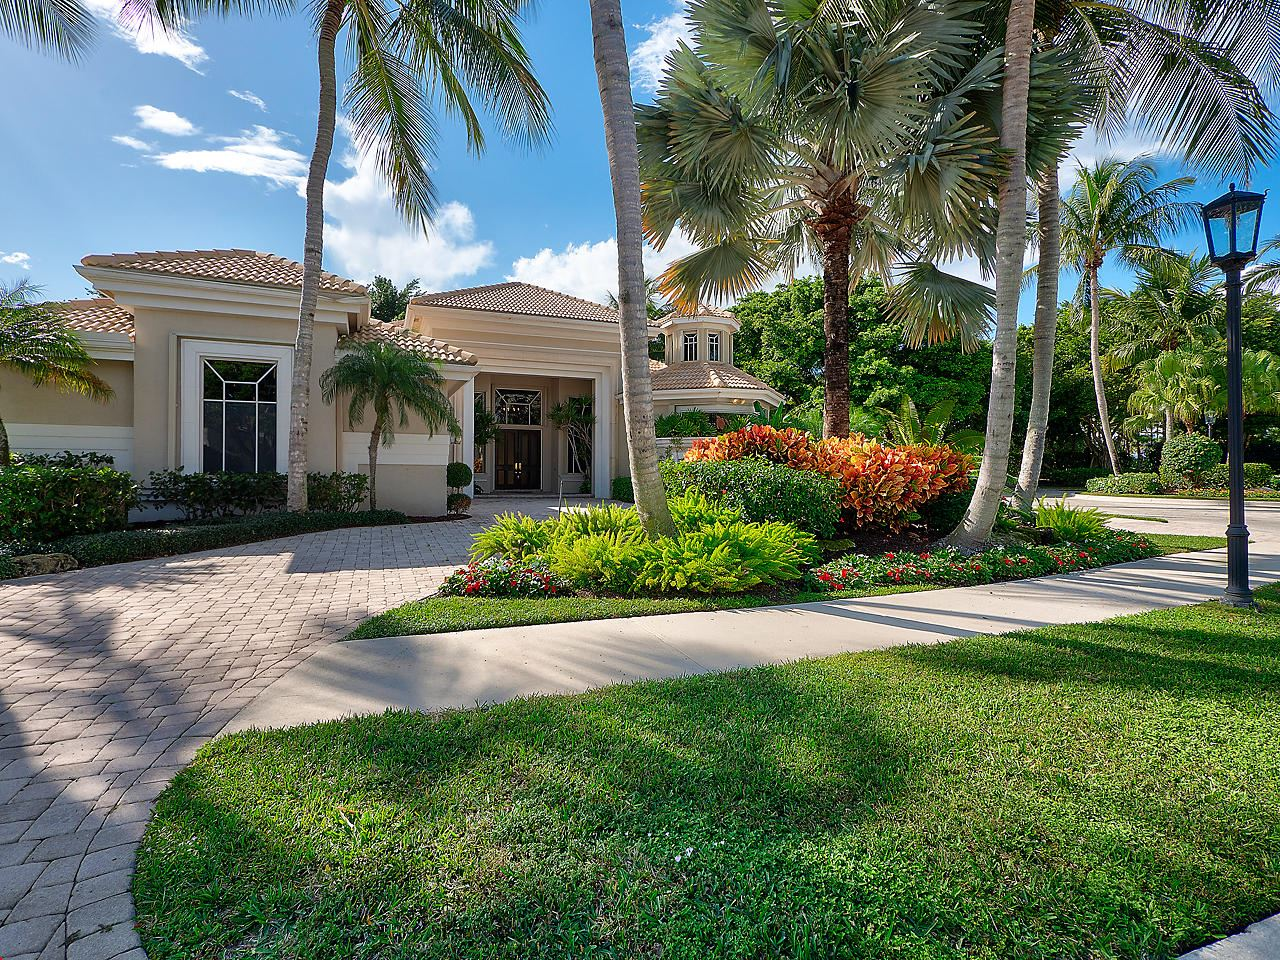 Photo of 129 Saint Martin Drive, Palm Beach Gardens, FL 33418 (MLS # RX-10581883)